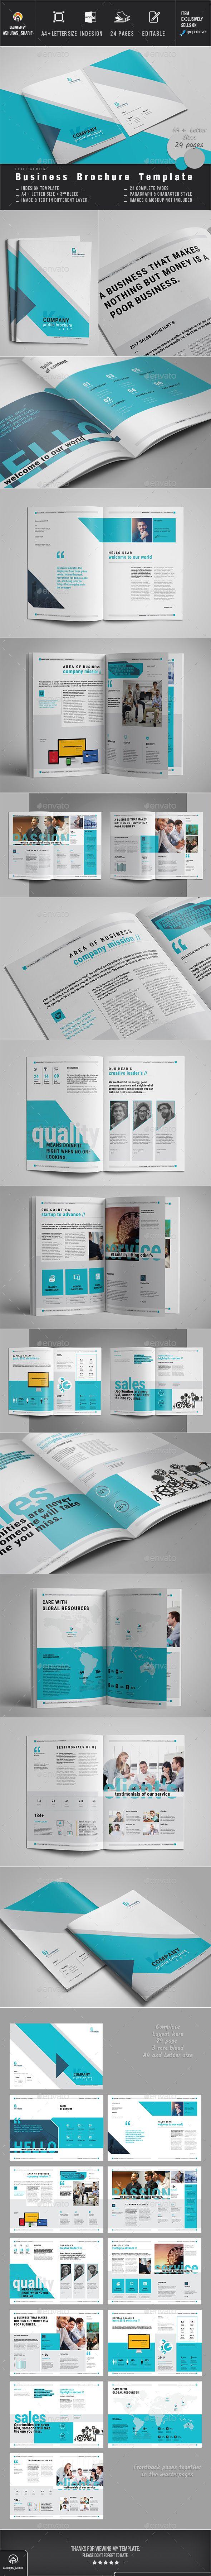 Business Brochure Design Template - Corporate Brochures Design Template InDesign INDD. Download here: https://graphicriver.net/item/business-brochure/18849369?ref=yinkira